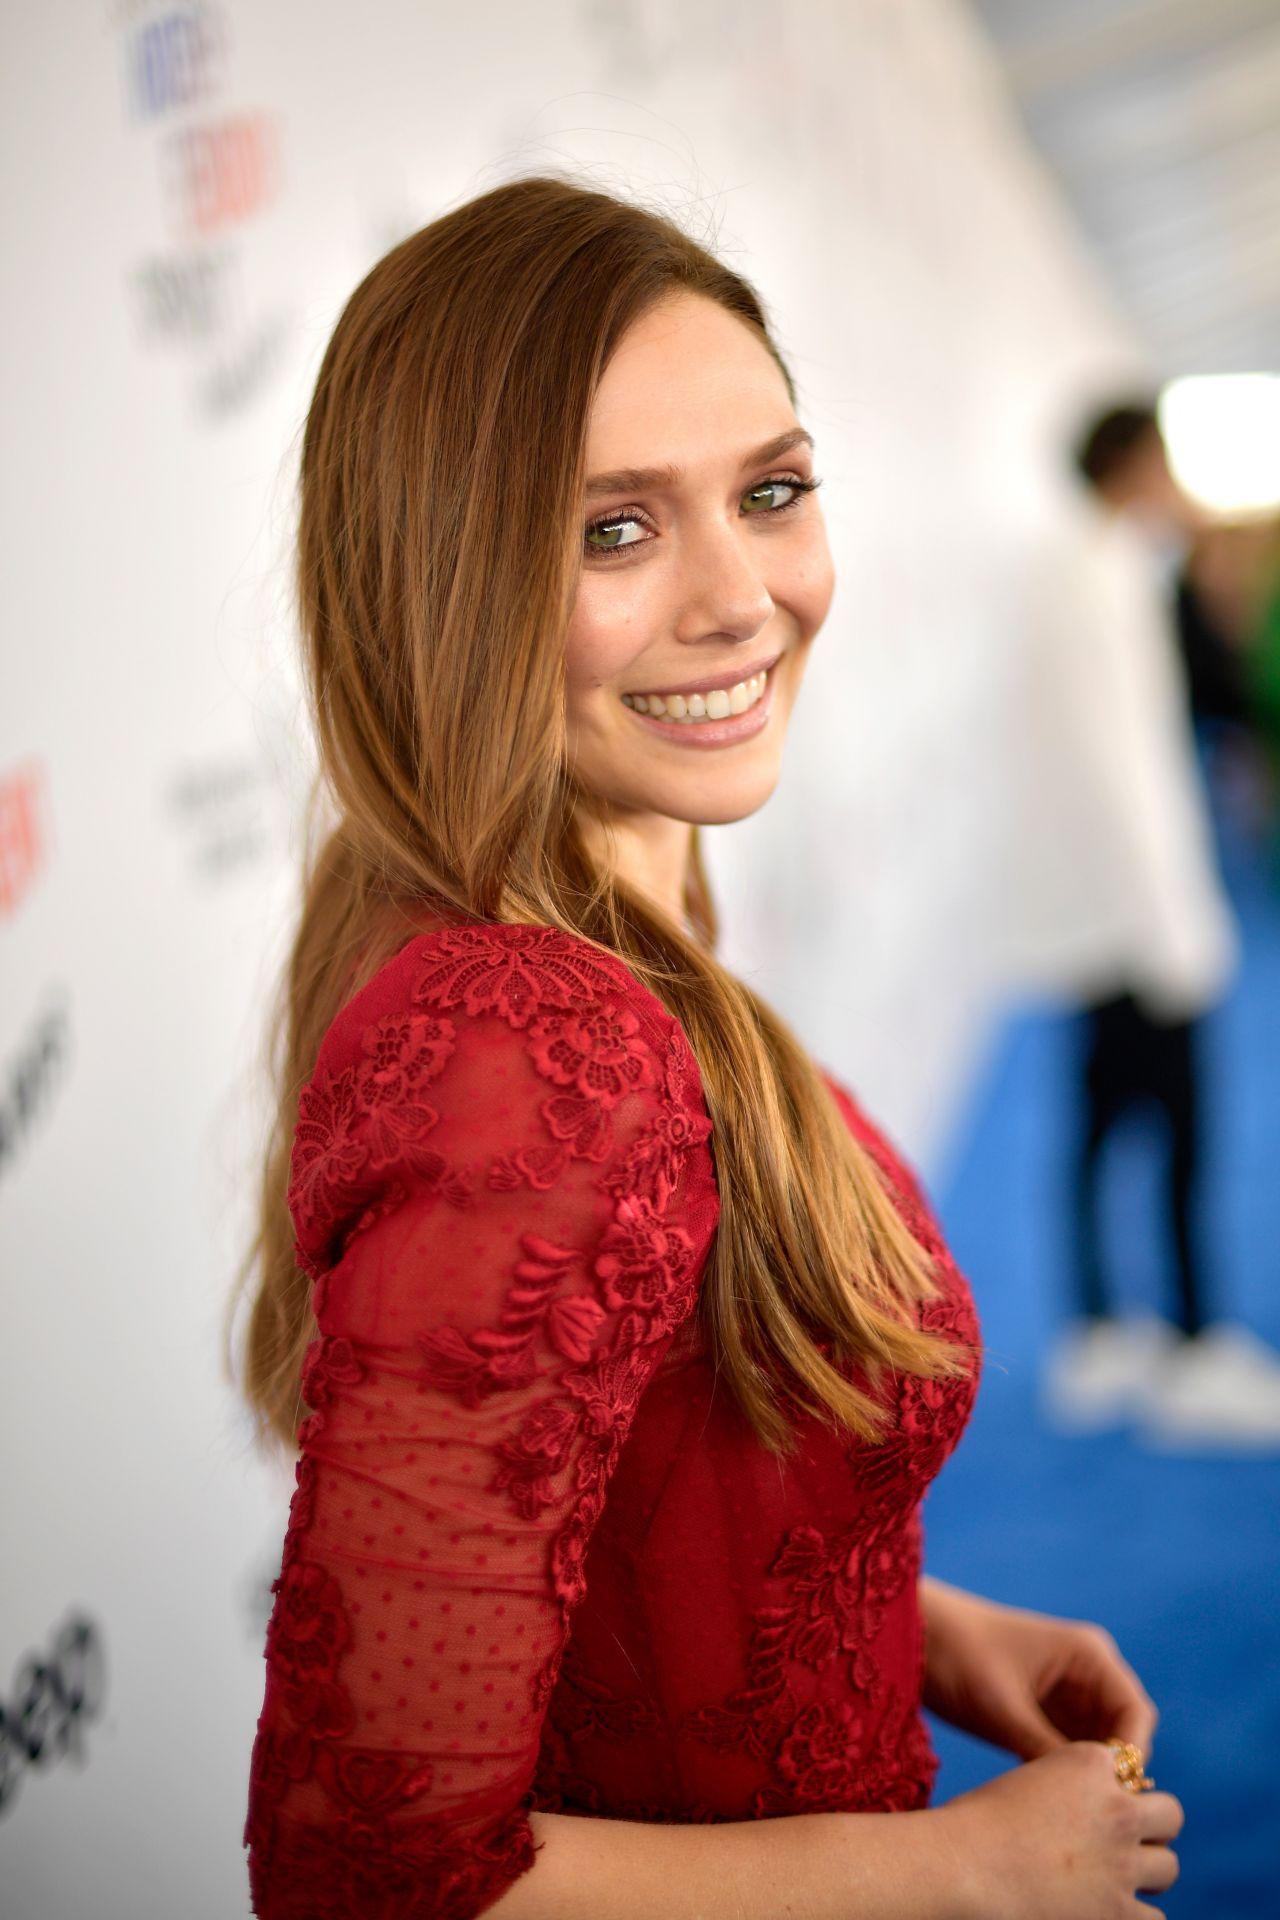 http://celebmafia.com/wp-content/uploads/2018/03/elizabeth-olsen-2018-film-independent-spirit-awards-in-santa-monica-2.jpg